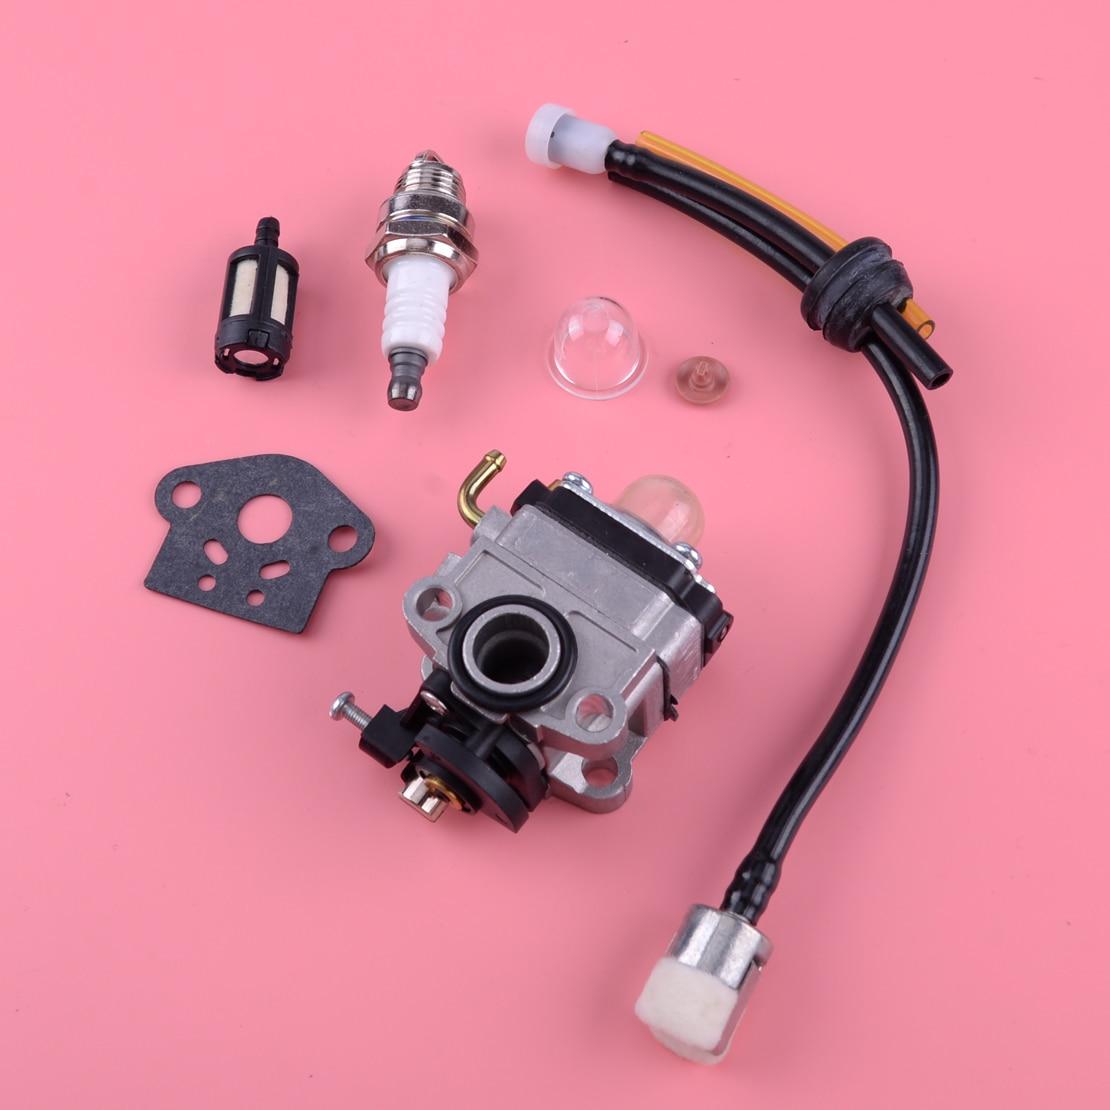 LETAOSK Carburetor Air Filter Spark Plug Tune Up Kit 753-04296 753-04745 Fit For Shindaiwa T230 LE230 S230 TCX230 X230 F230 C230